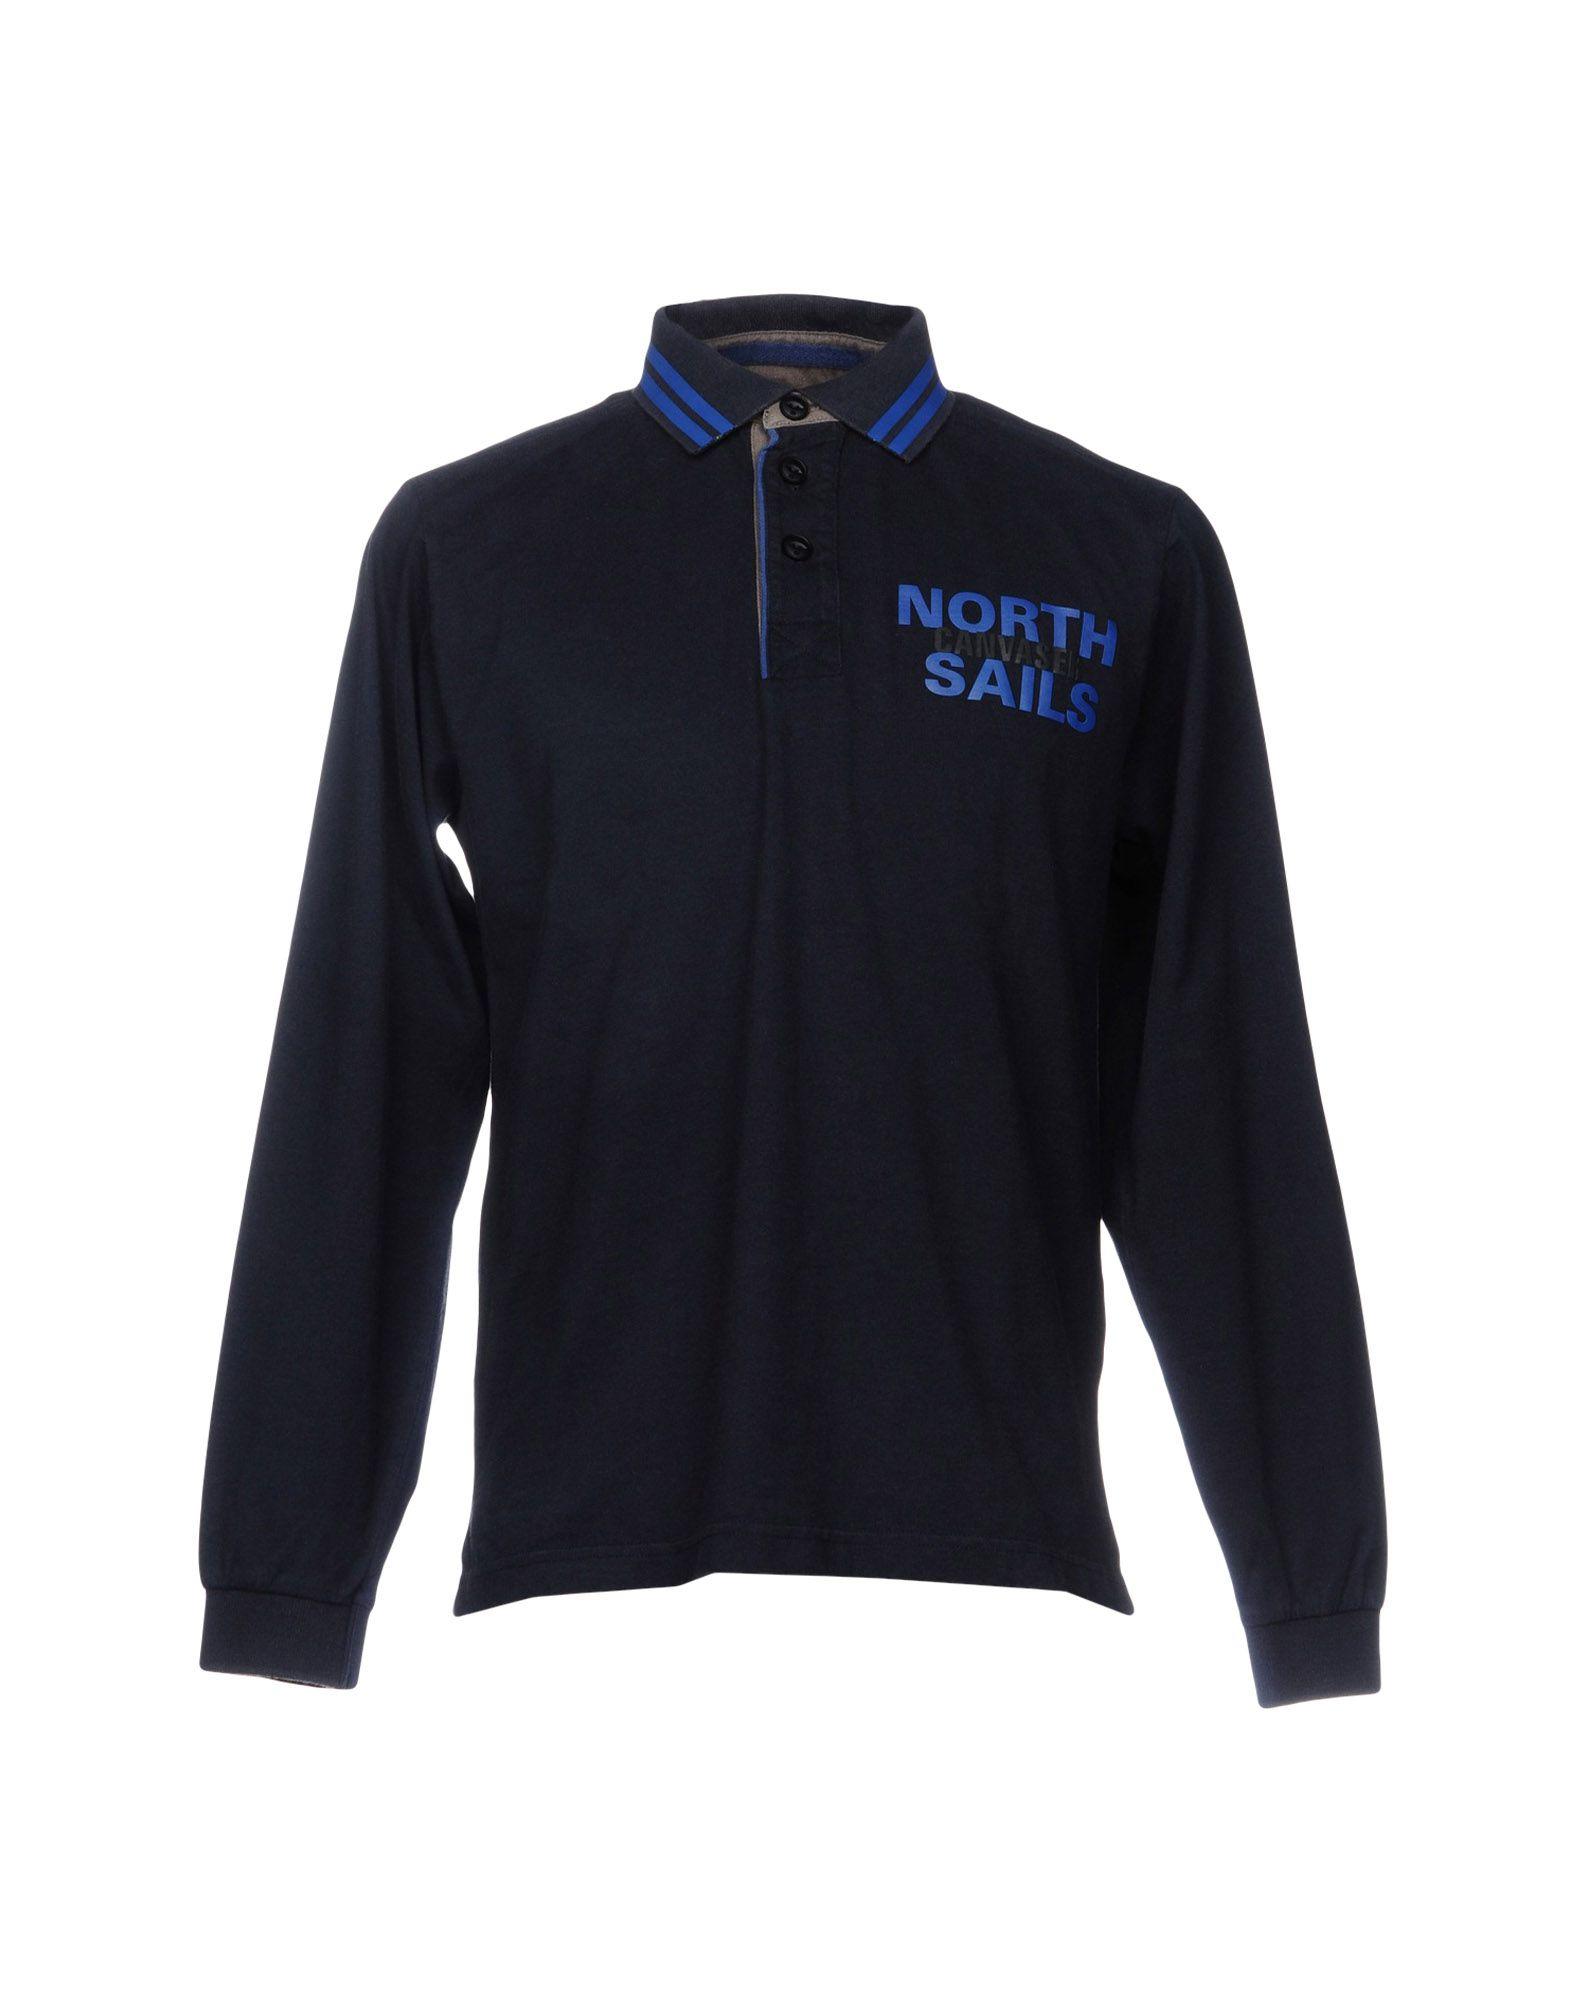 NORTH SAILS Herren Poloshirt5 blau